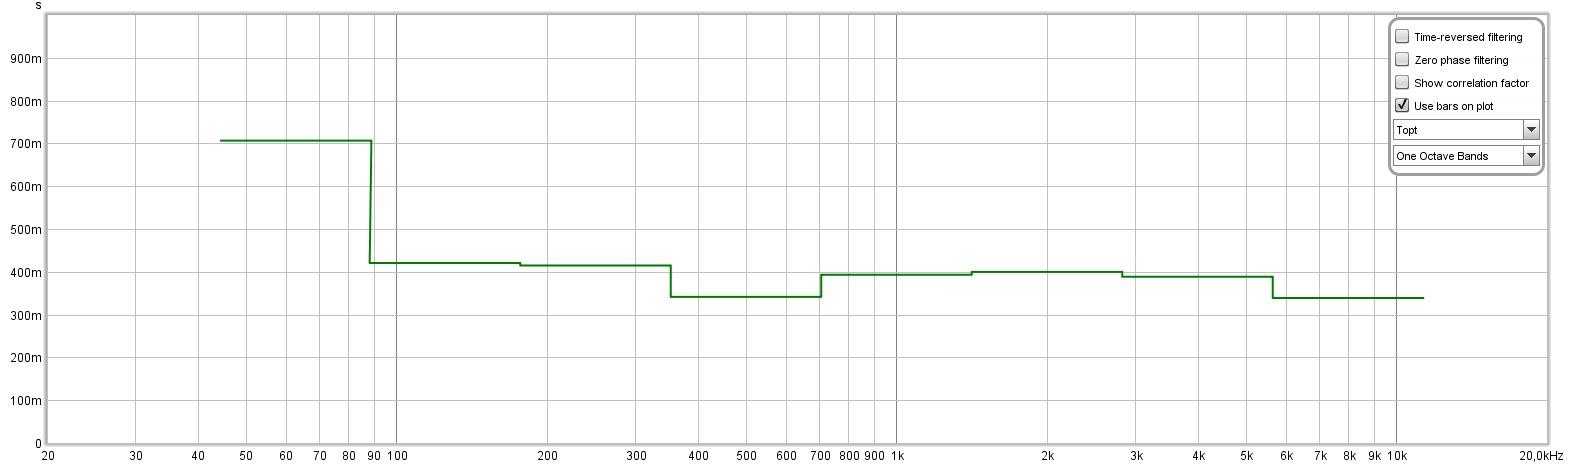 speakers 1 - 10-20000hz RT60.jpg